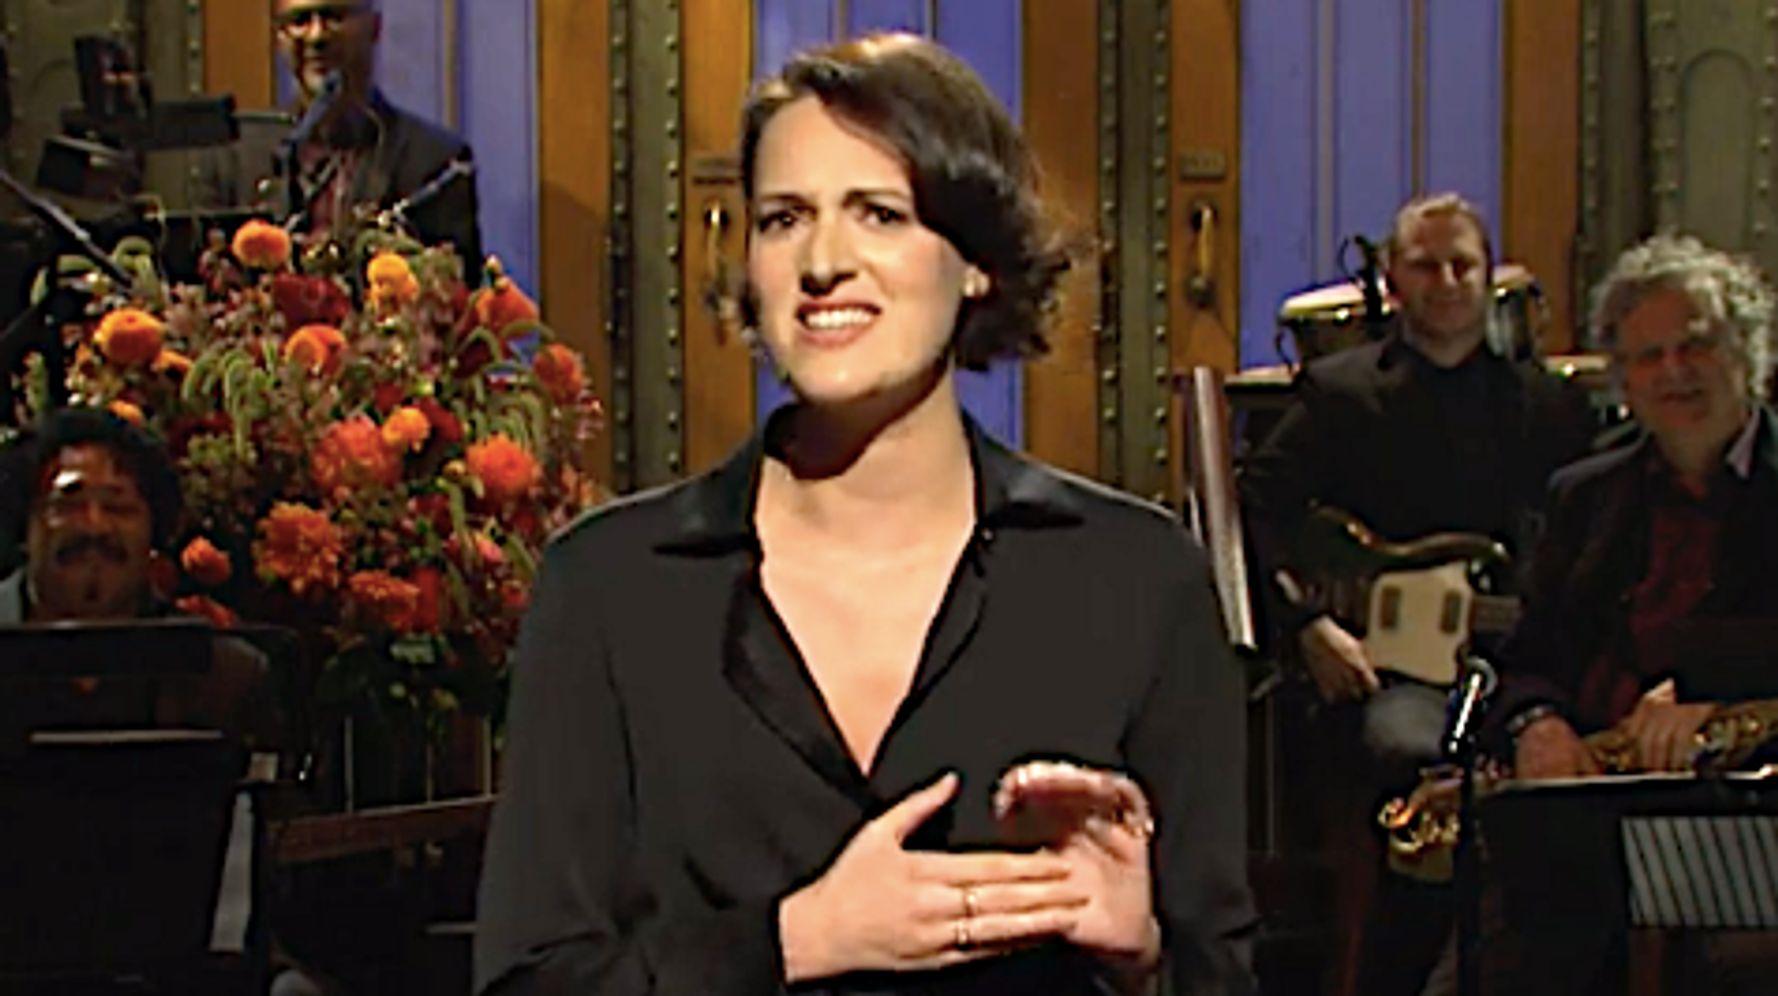 Westlake Legal Group 5d9992d0200000d3024da815 Phoebe Waller-Bridge Goes Full 'Fleabag' On 'Saturday Night Live'